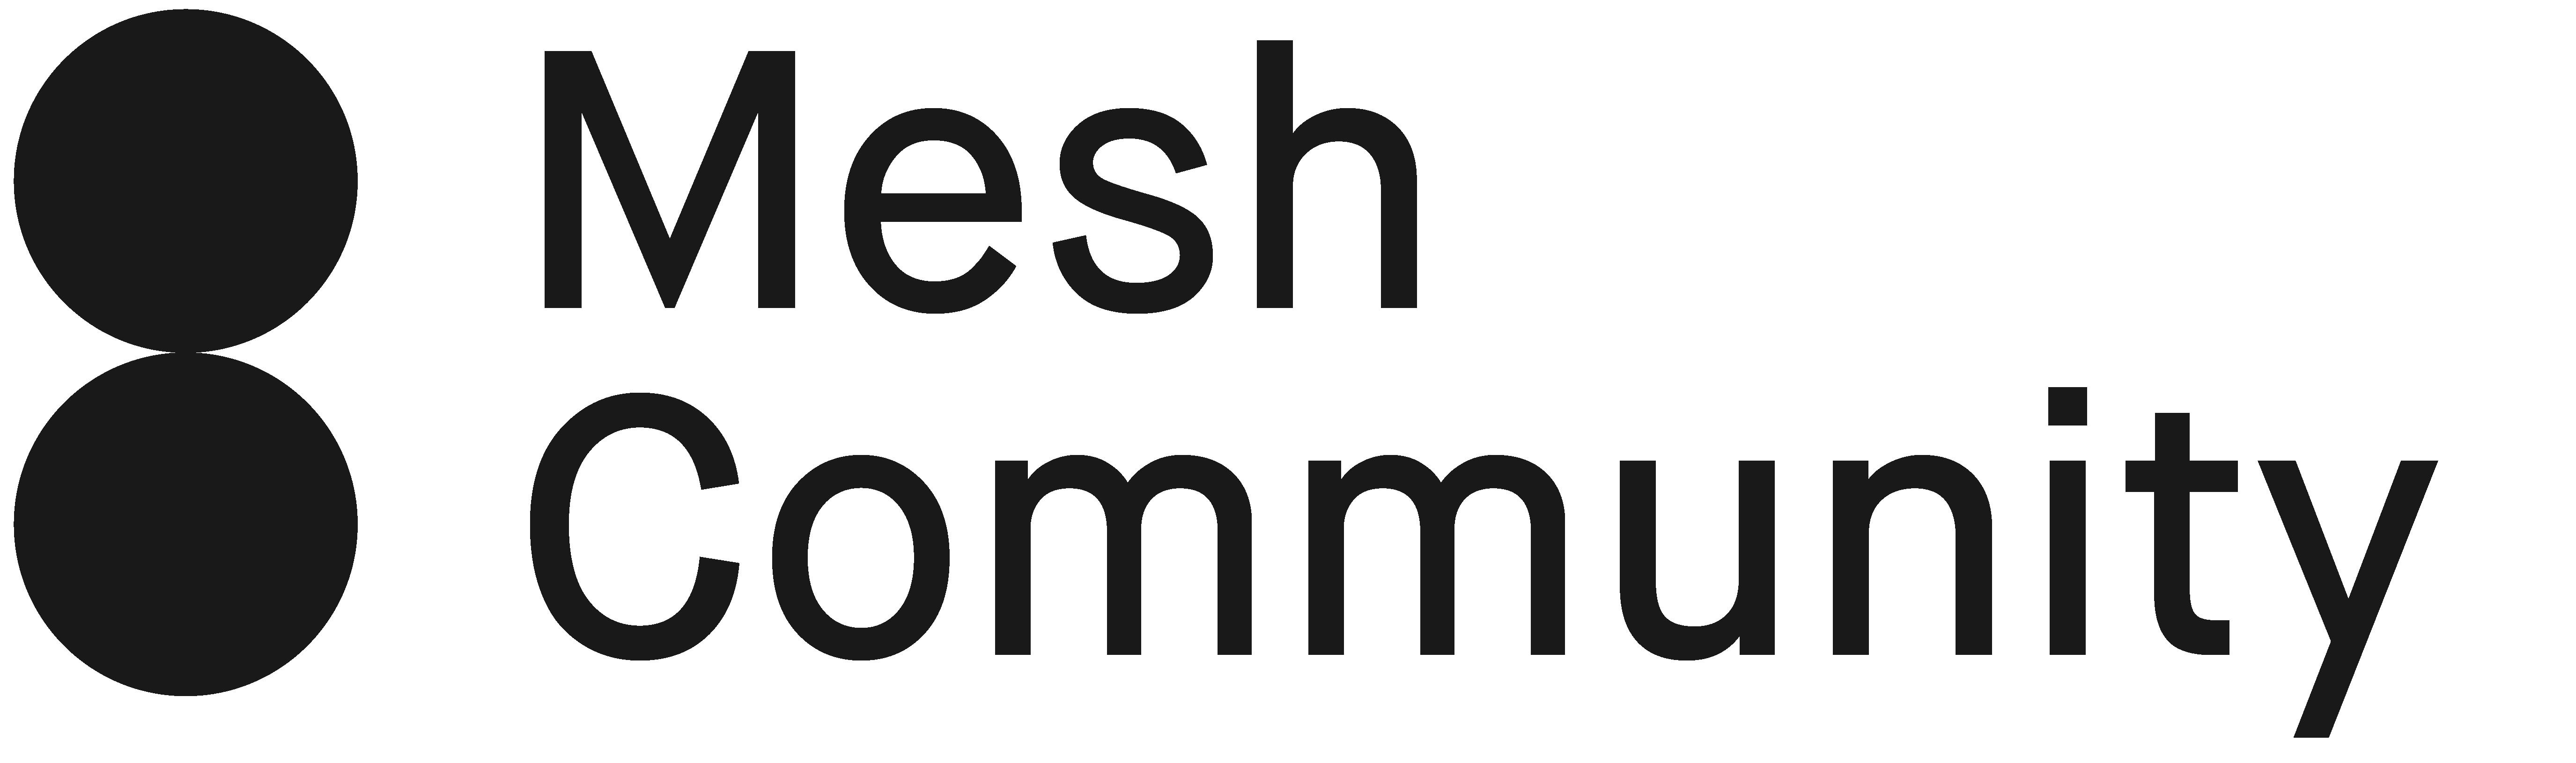 Mesh Community